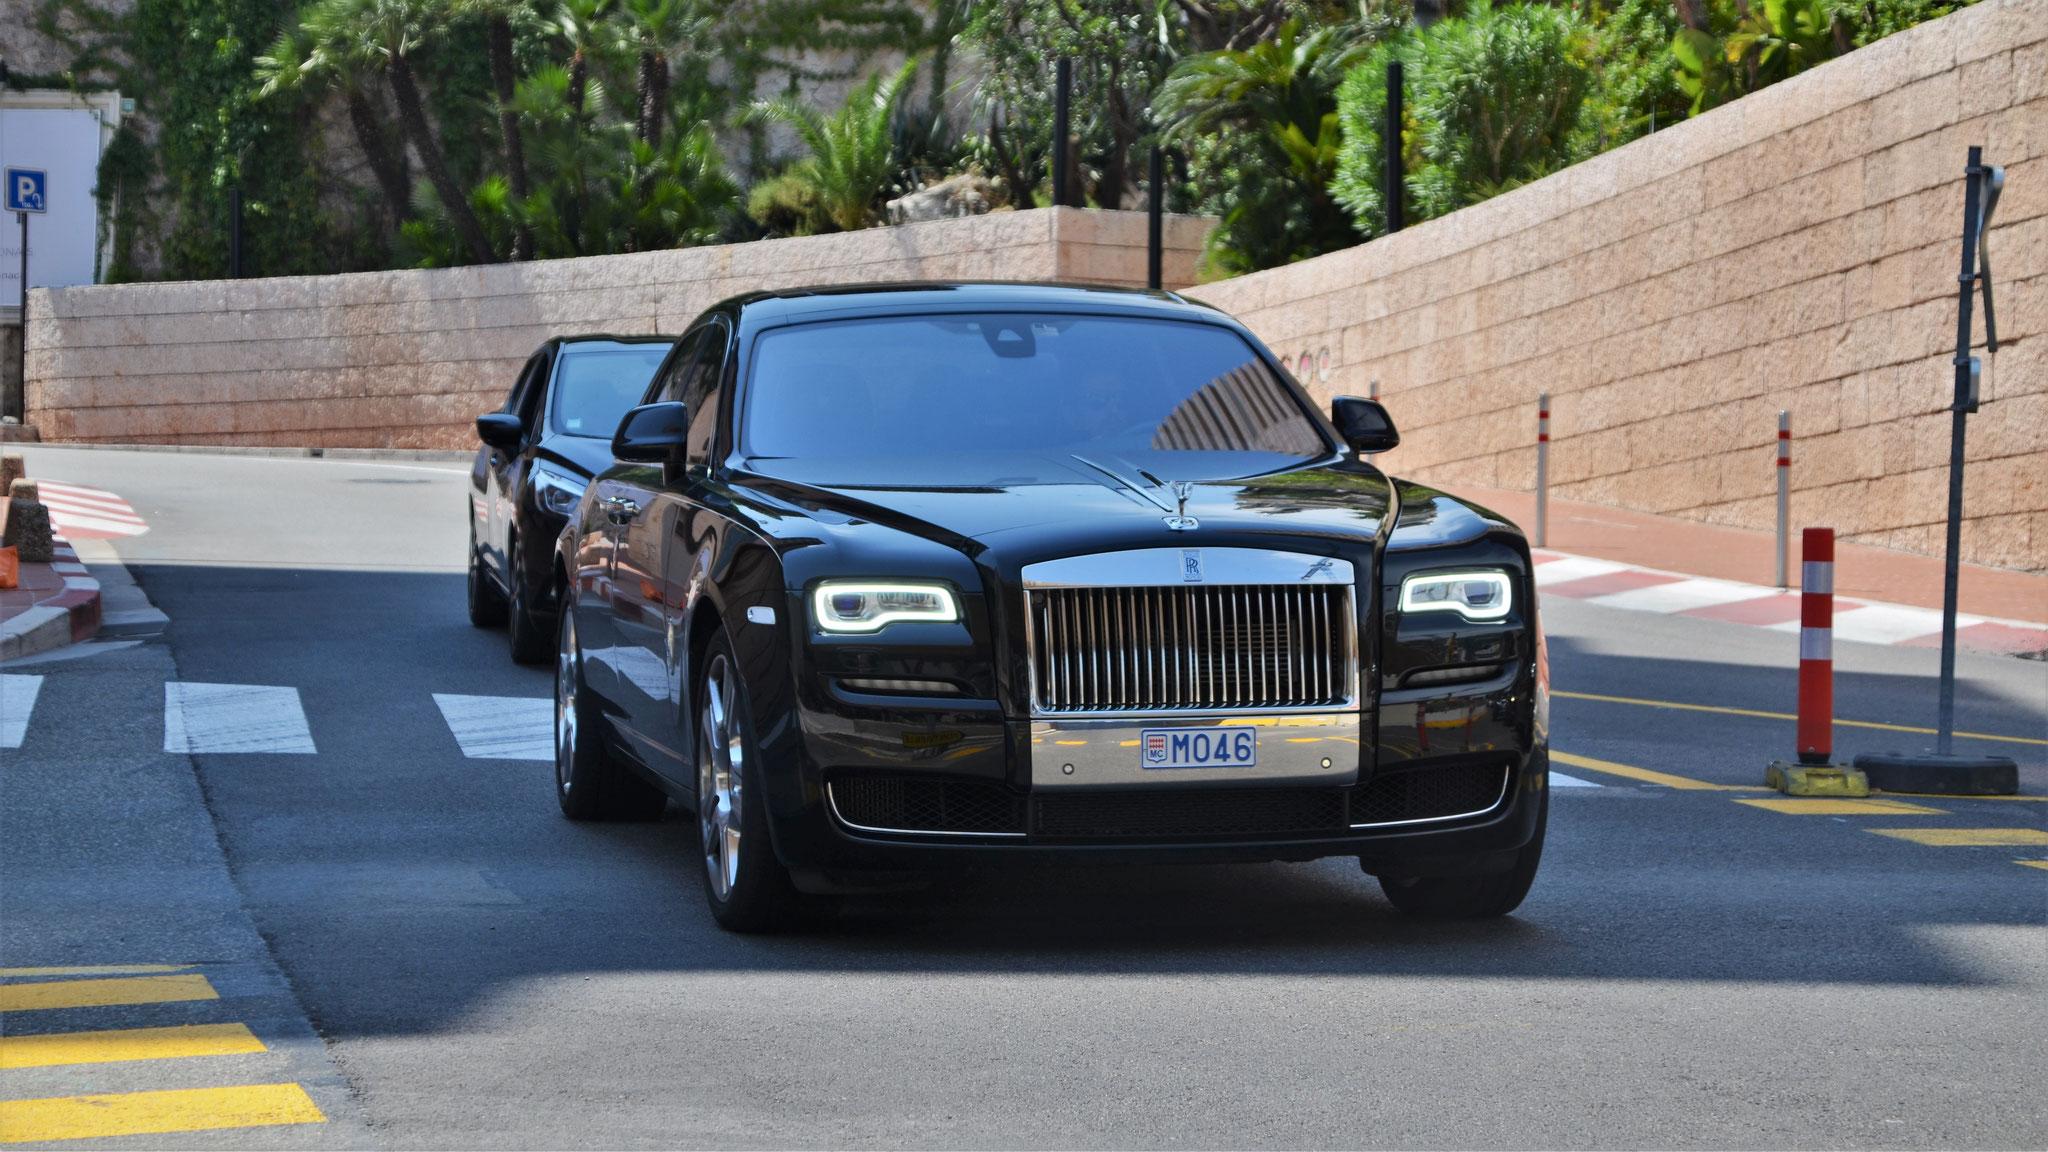 Rolls Royce Ghost Series II - M046 (MC)